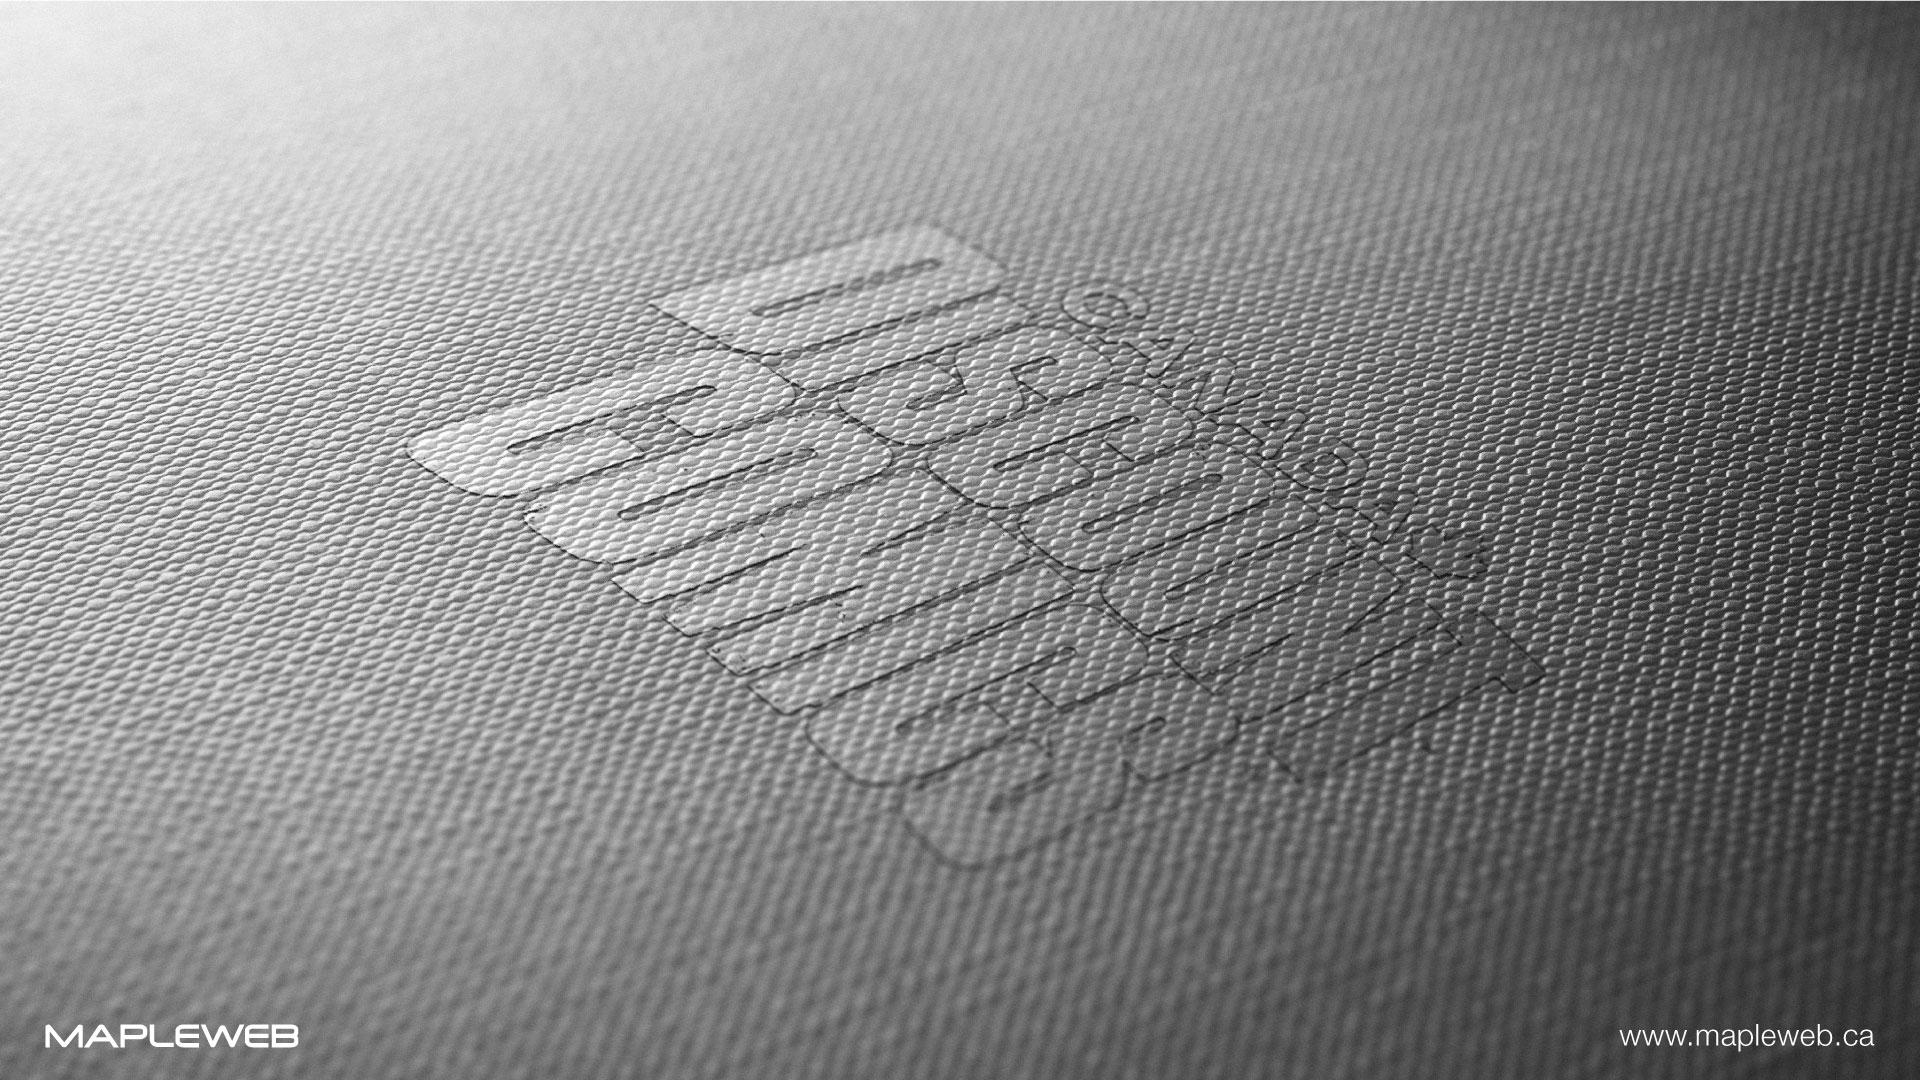 canada-discount-comic-brand-logo-design-by-mapleweb-vancouver-canada-white-silver-mock